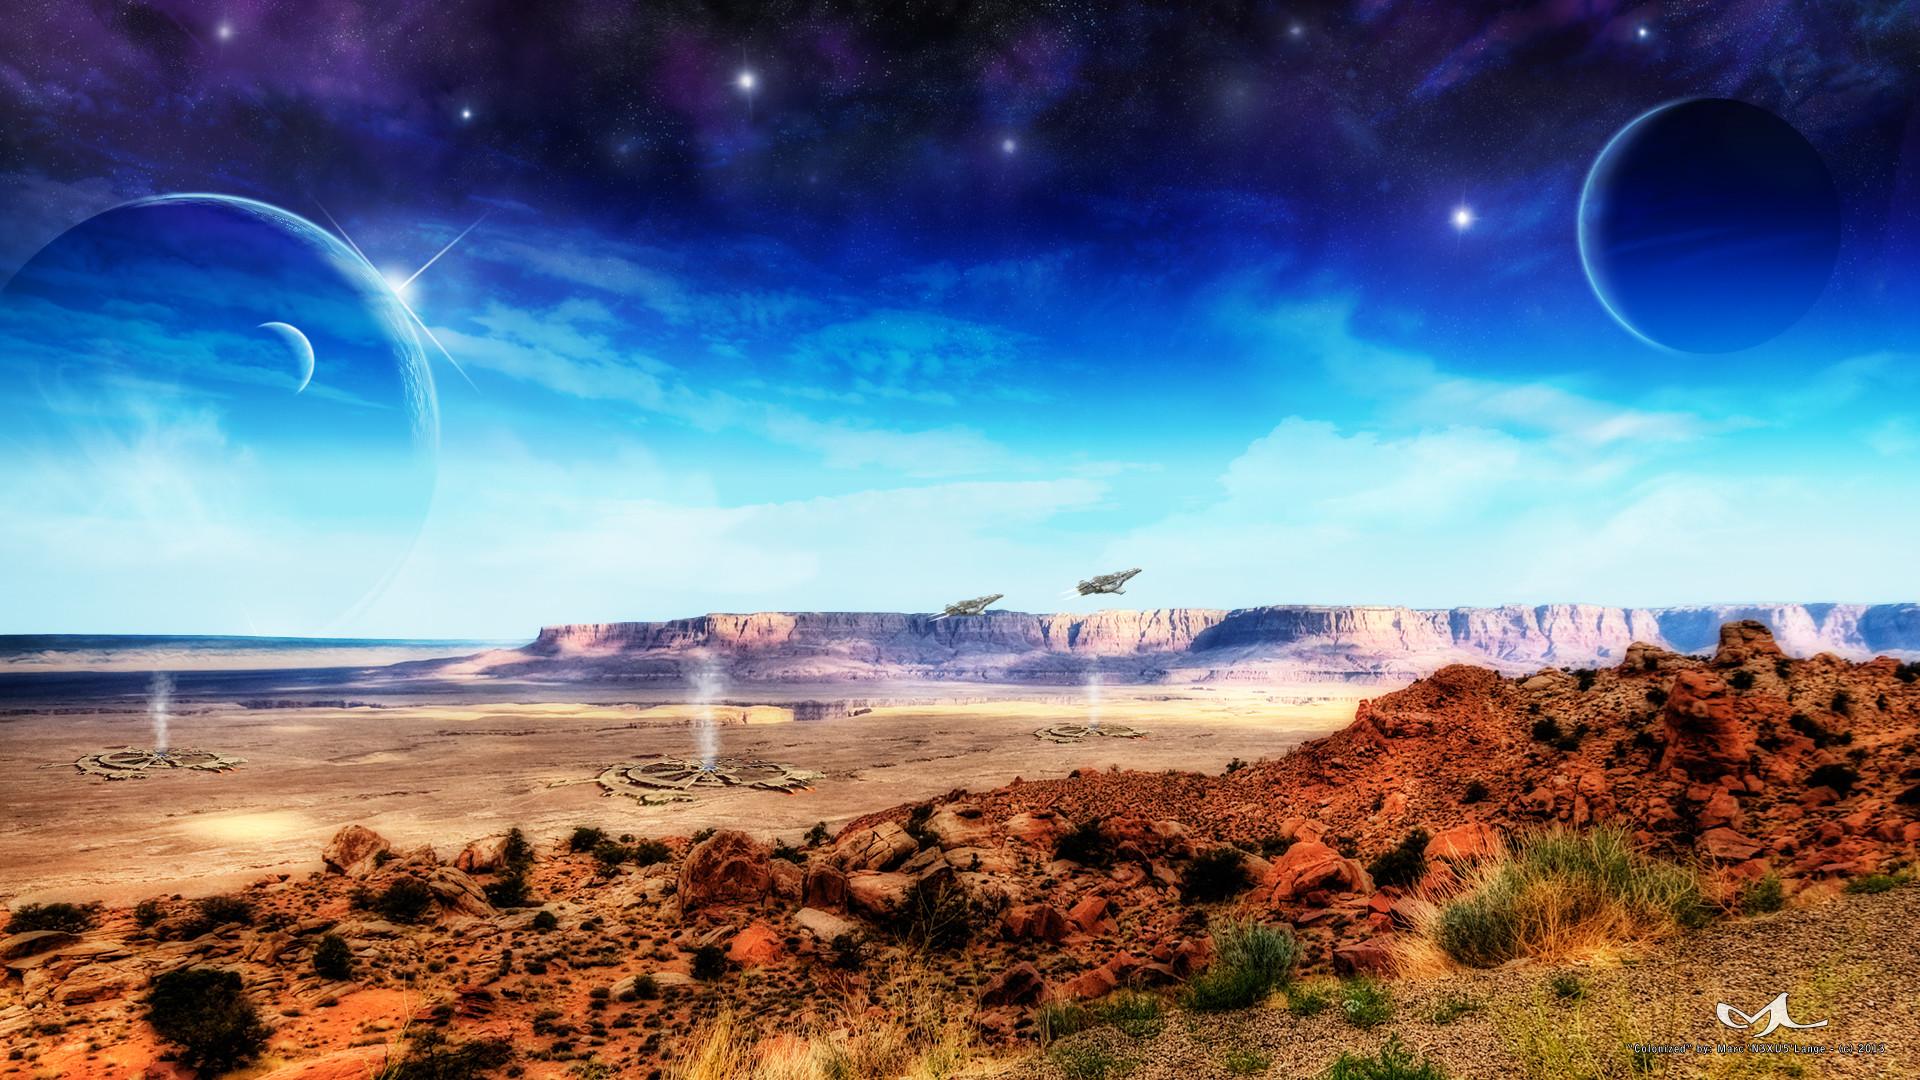 Sci Fi – Landscape Colonized Sci Fi Science Fiction Planet Spaceship Space  Wallpaper